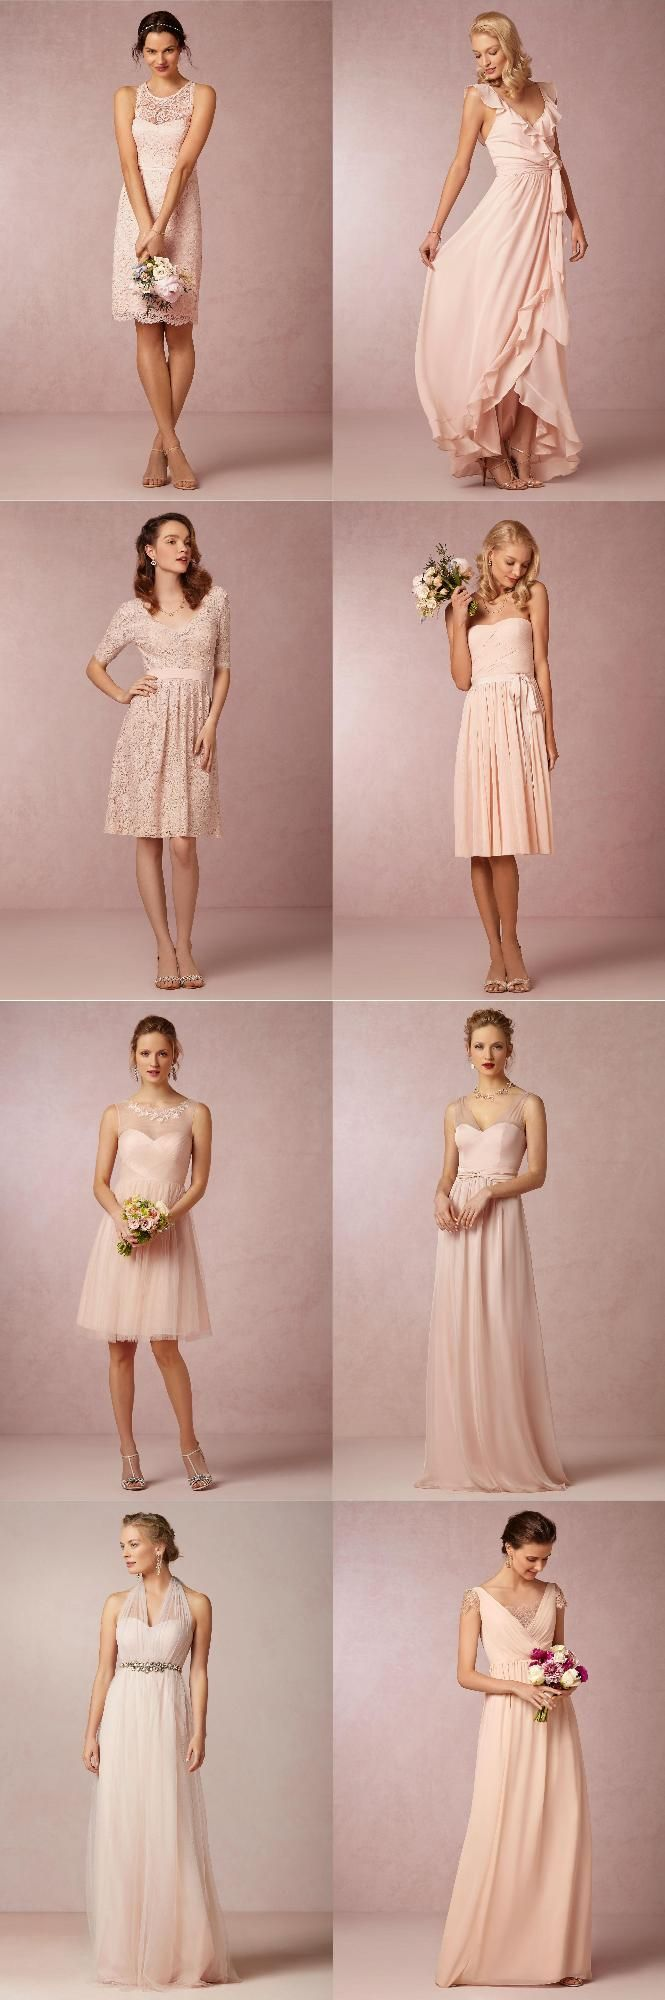 Wedding Trend: Blush Bridesmaid Dresses | Boda